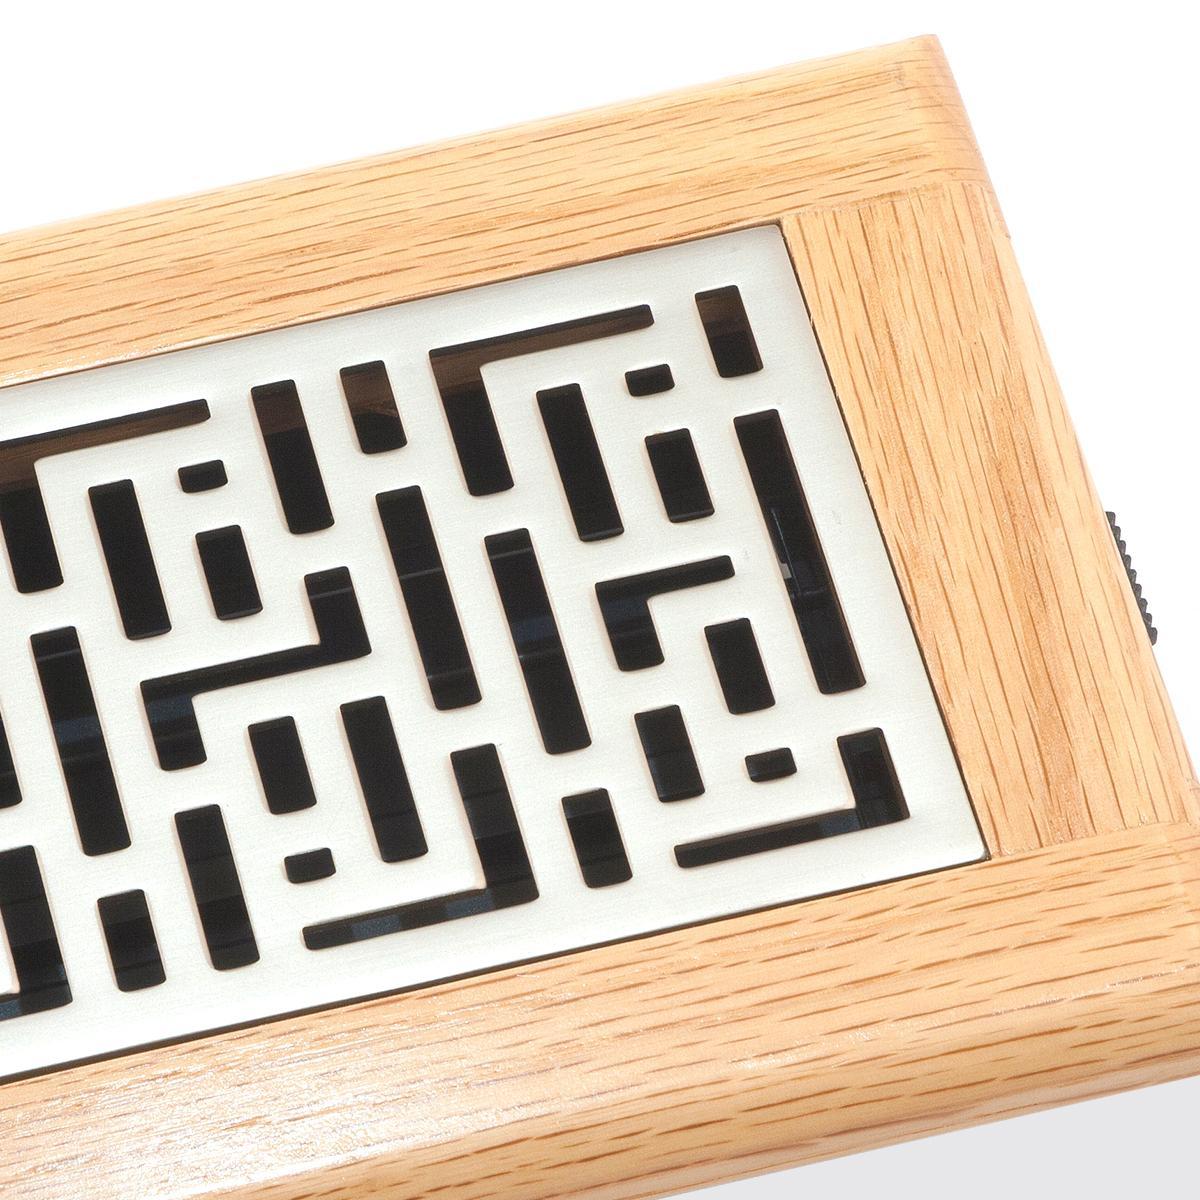 Accord gfosn410 oak frame floor register with forte design for Wood floor register 8 x 10